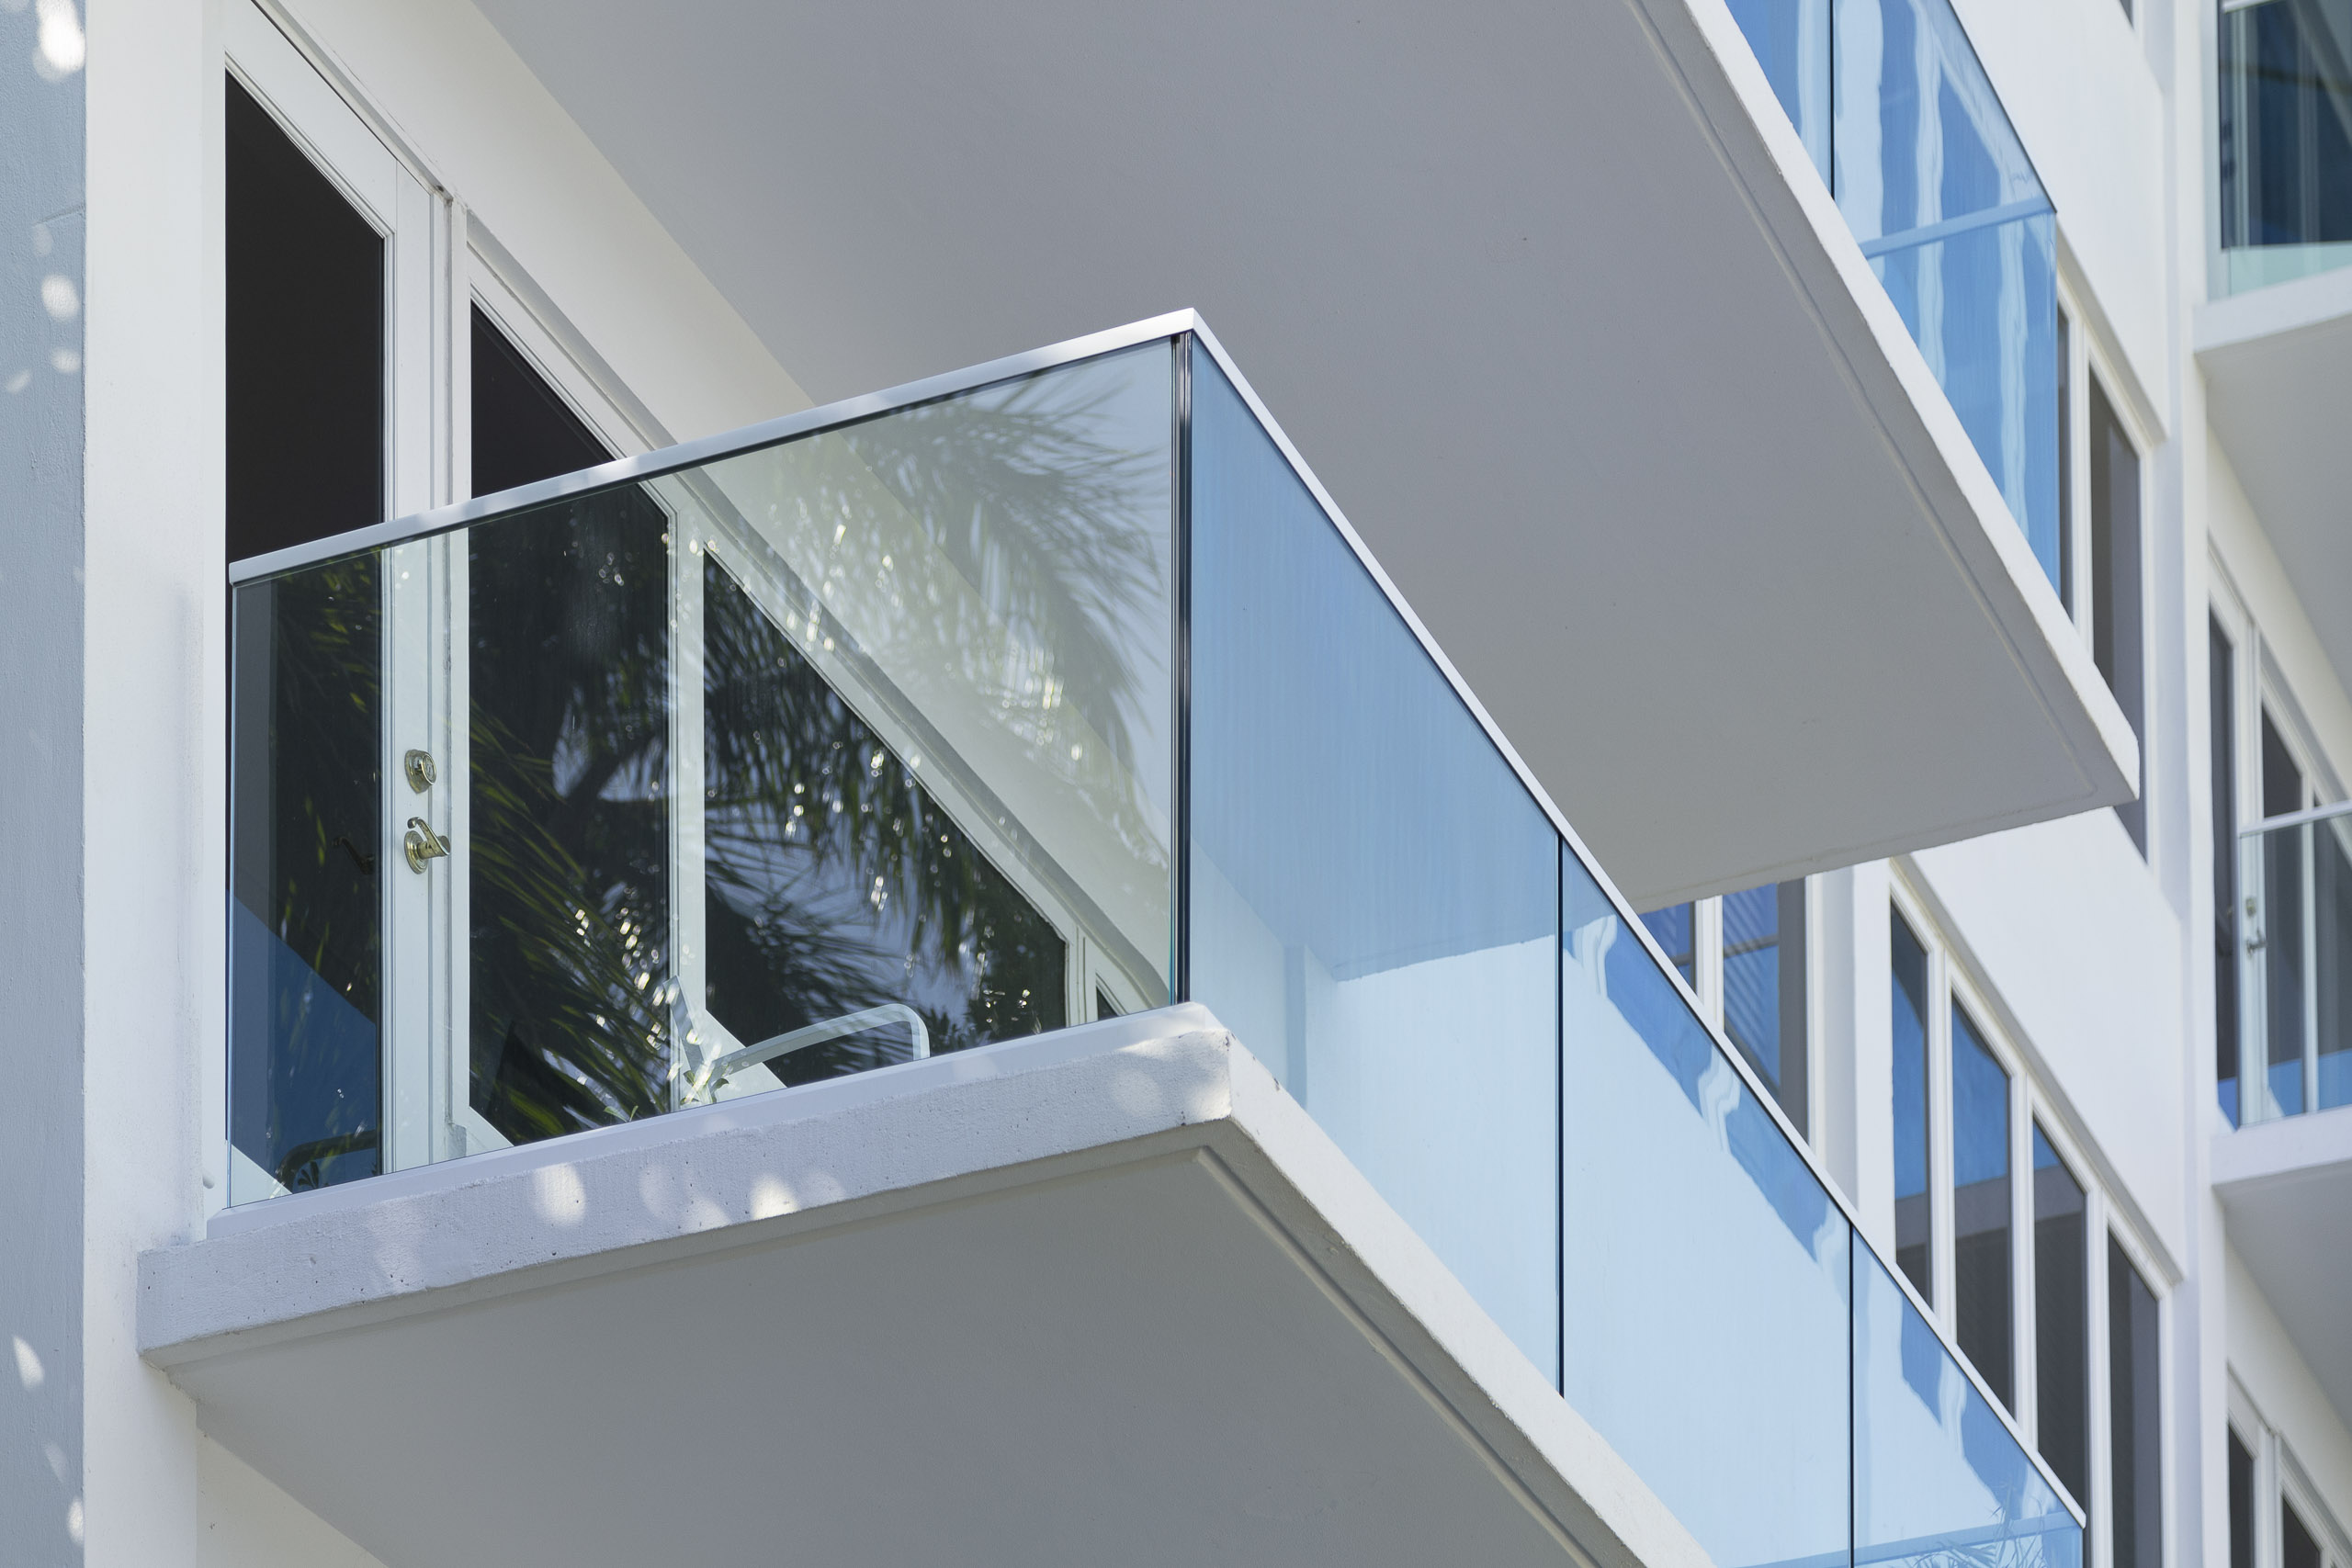 Infinity Glass on Boca Inlet Condo